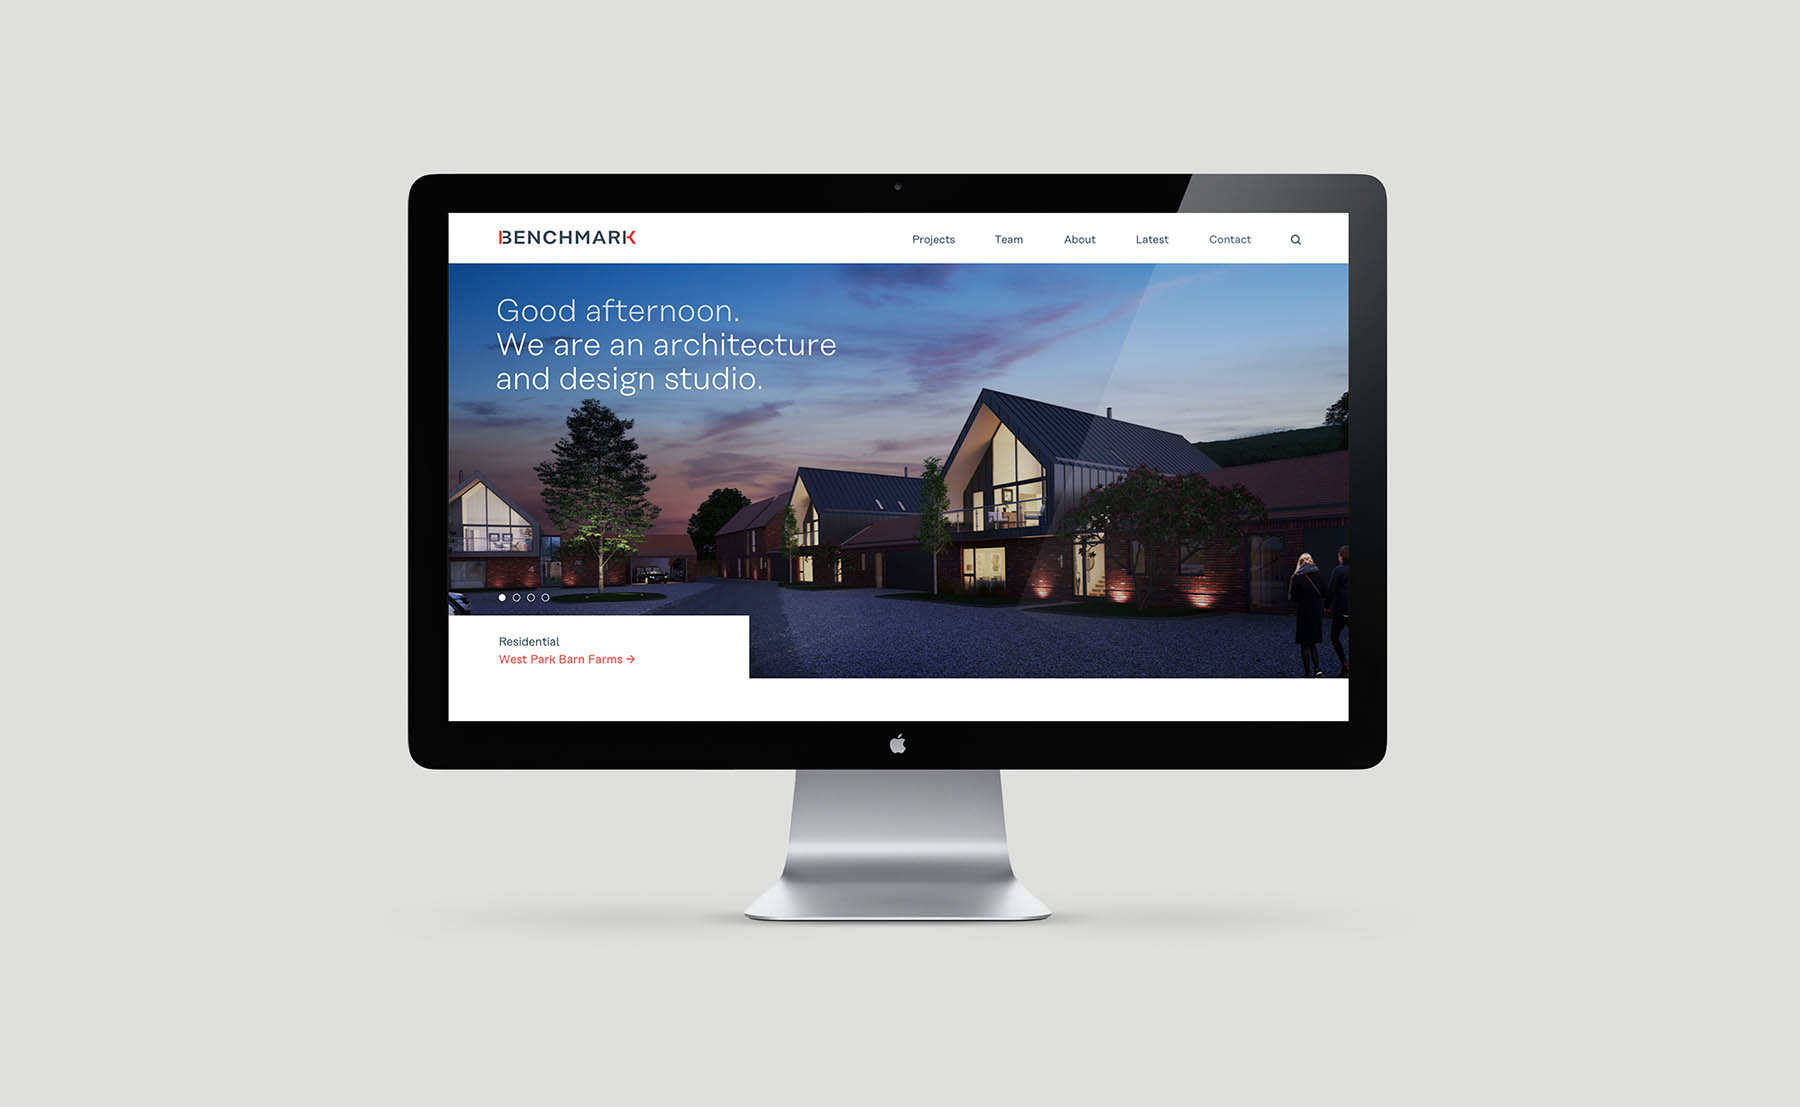 benchmark architects website design by Leeds based Freelance Designer Neil Holroyd